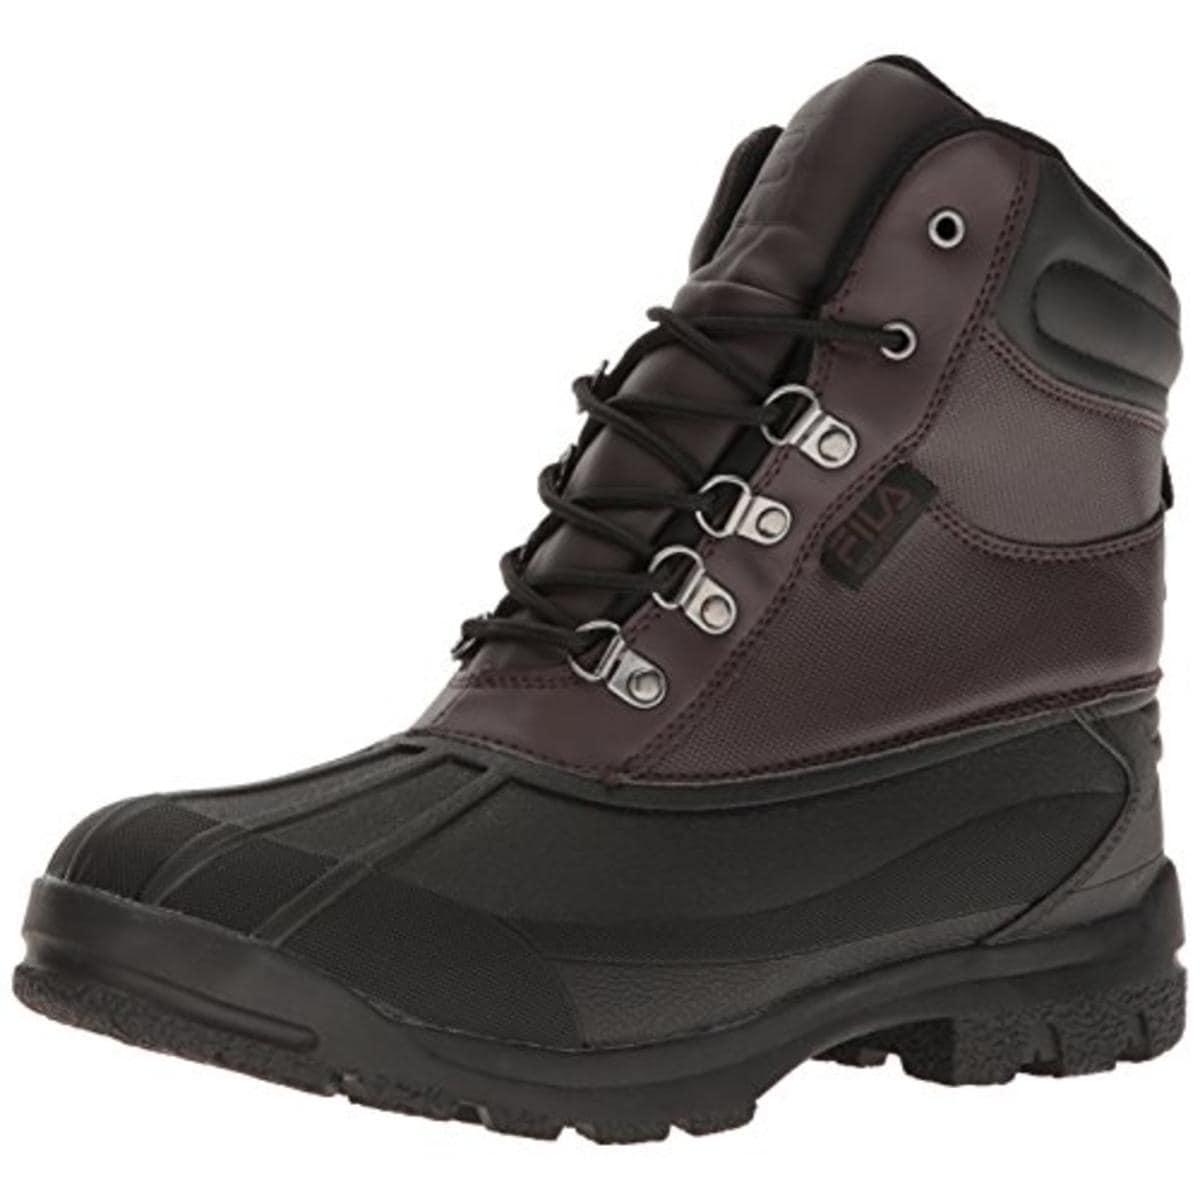 Fila Mens Weathertech Extreme Pac Boots